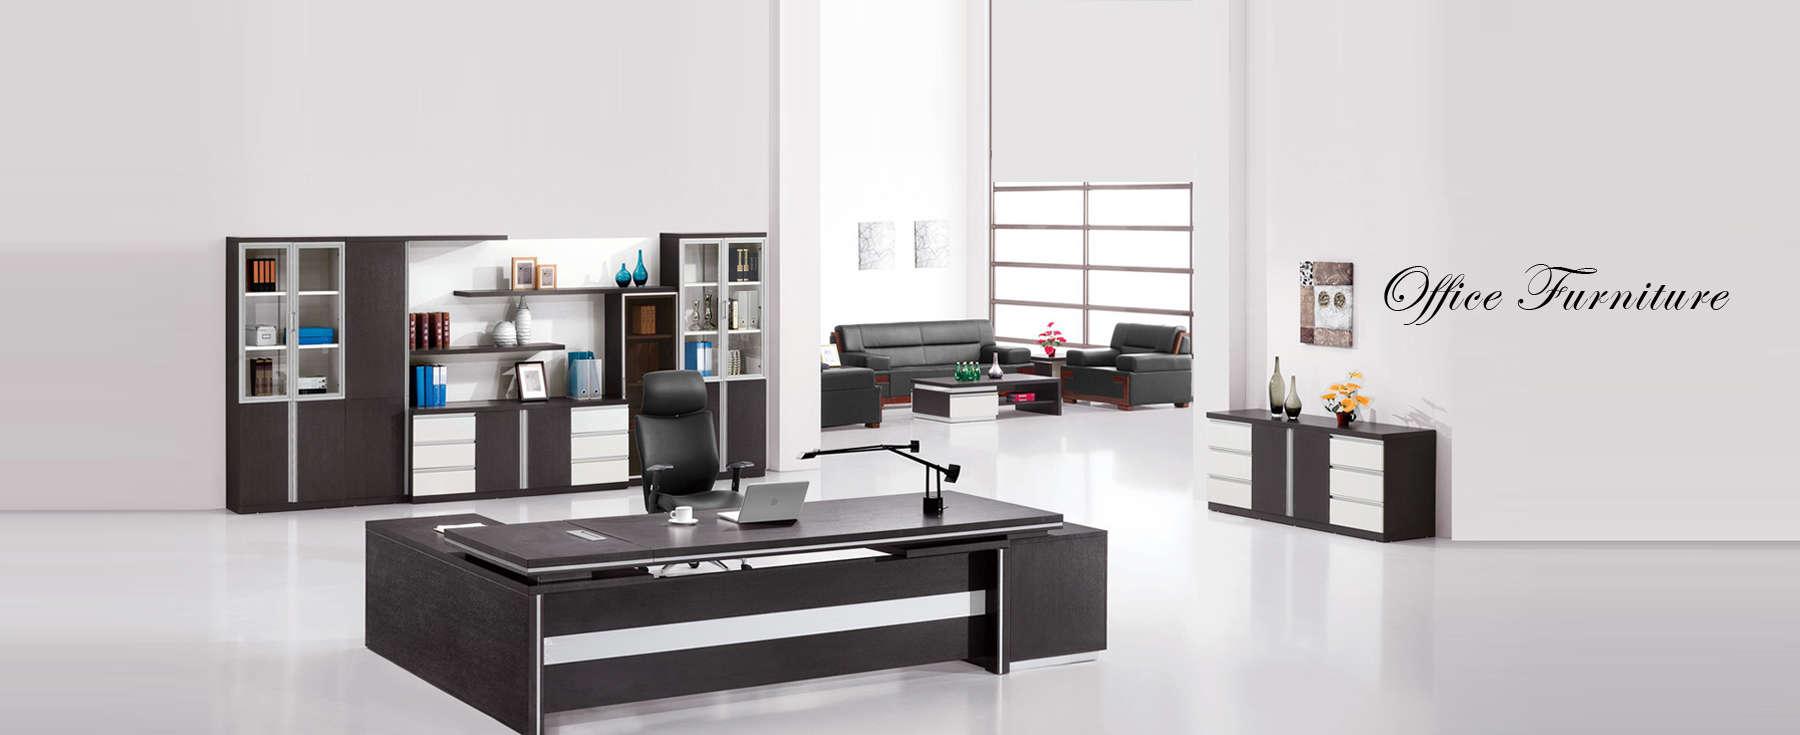 Greshil Interiors Living Room Furniture Diningroom Bedroom - Indroyal bedroom furniture